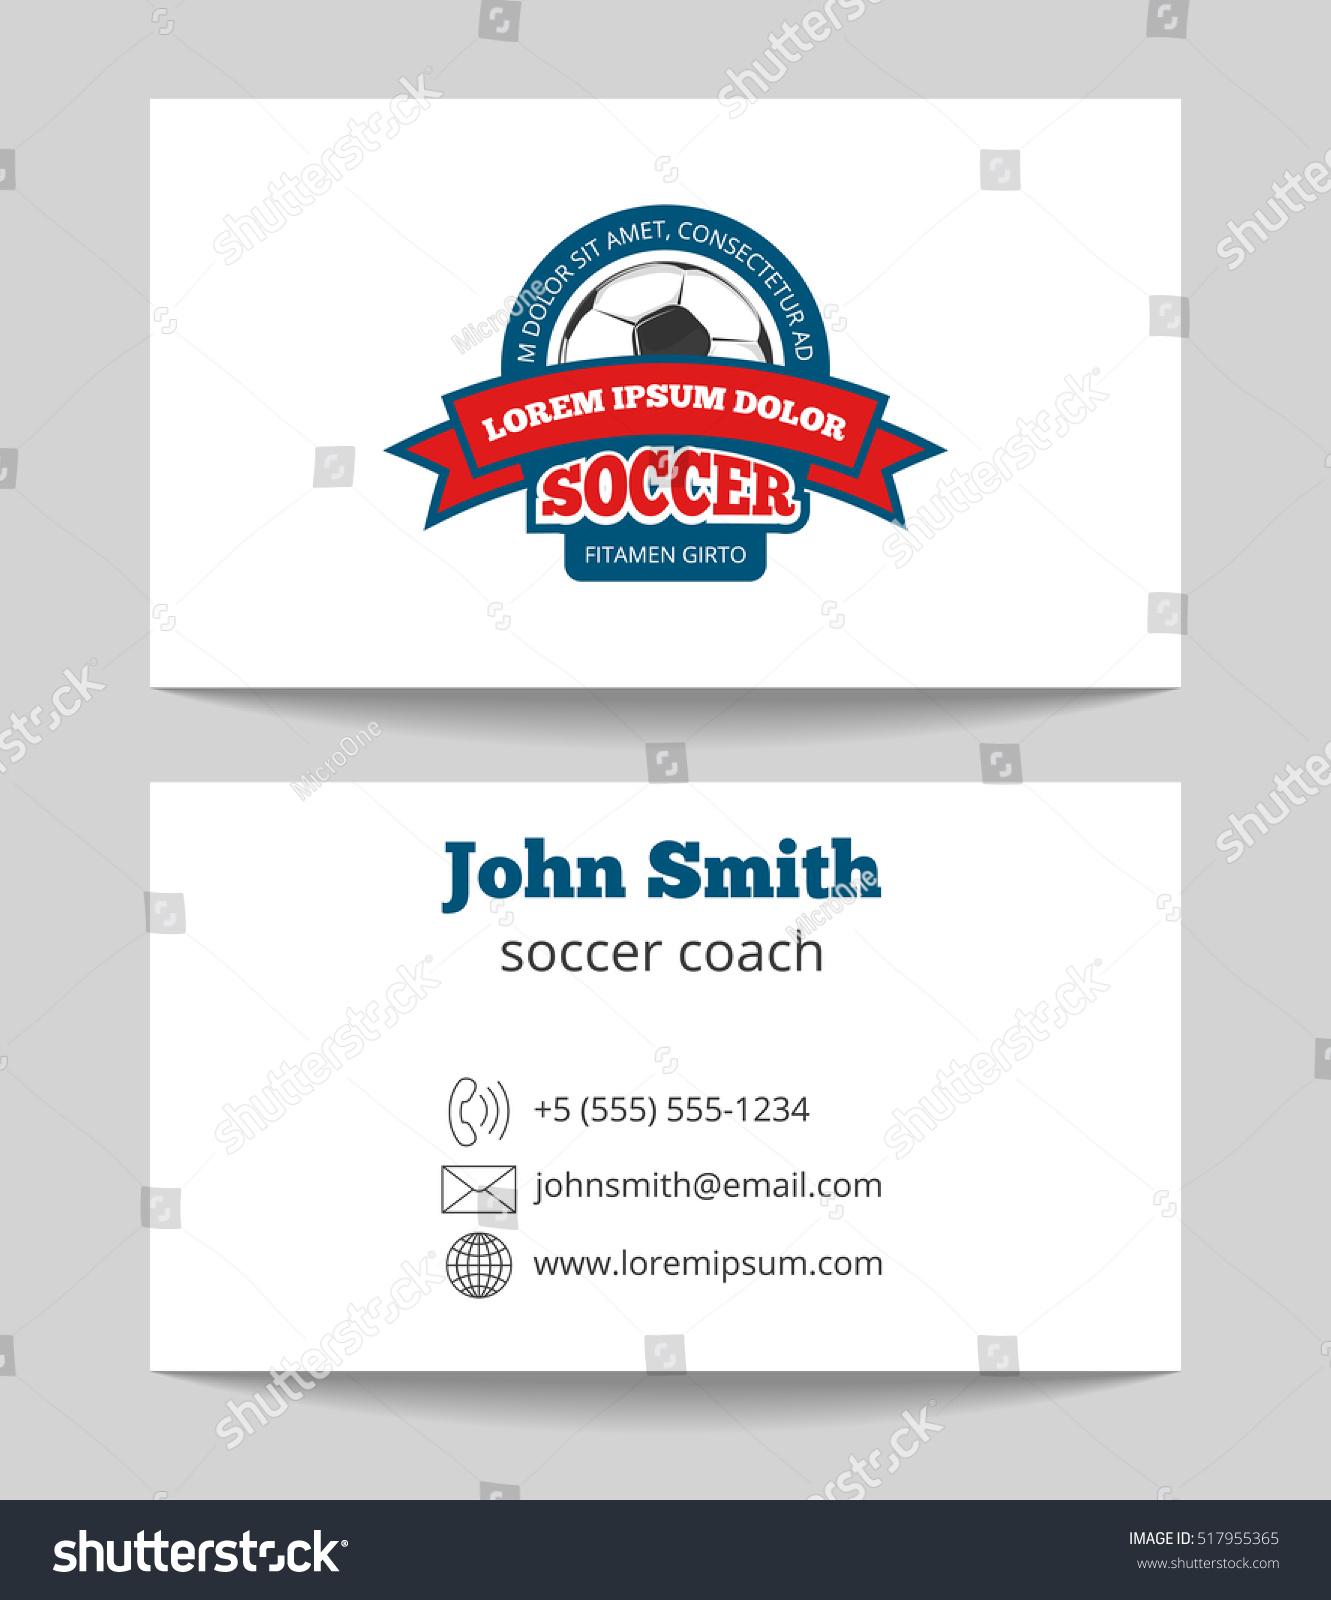 Soccer Coach Business Card Template Logo Stock Illustration ...